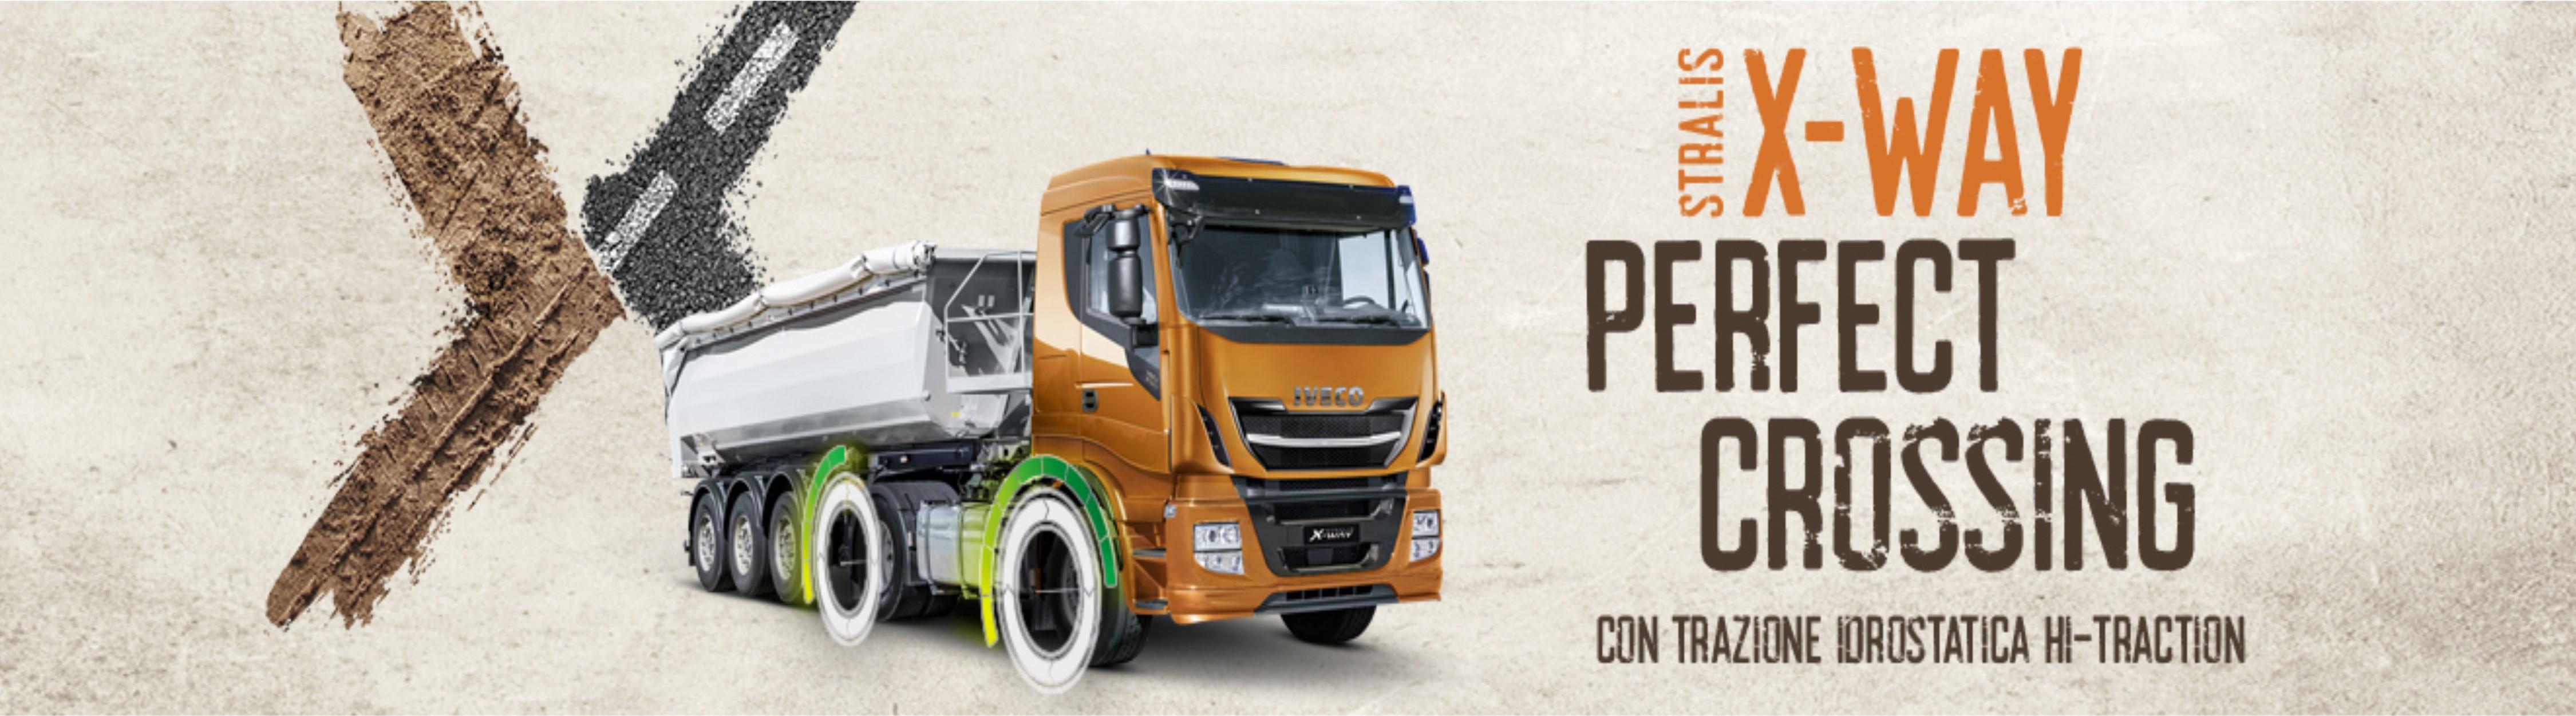 Stralis X-Way trattore: offerta!